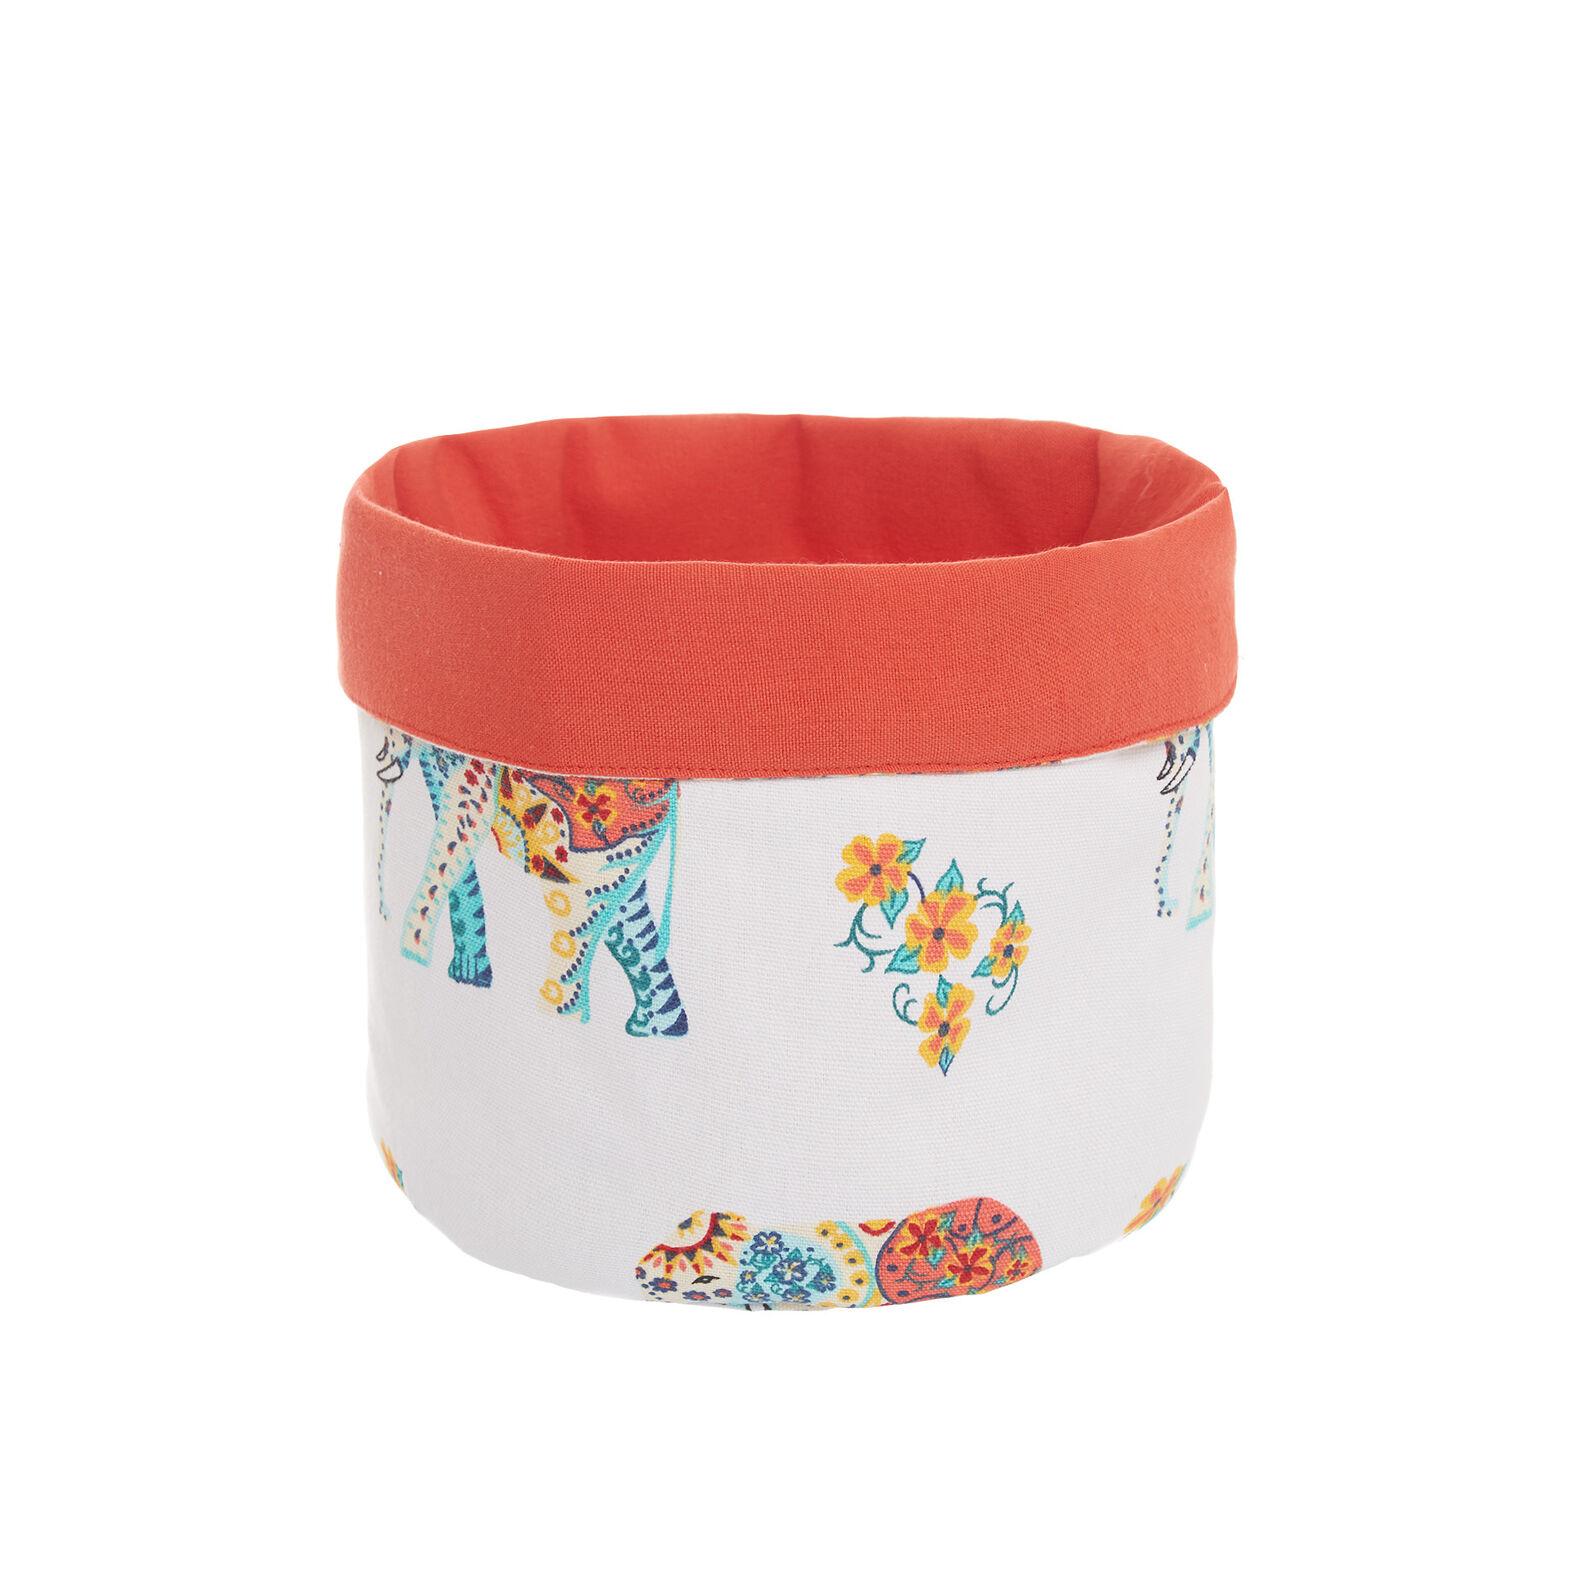 100% cotton basket with elephants print